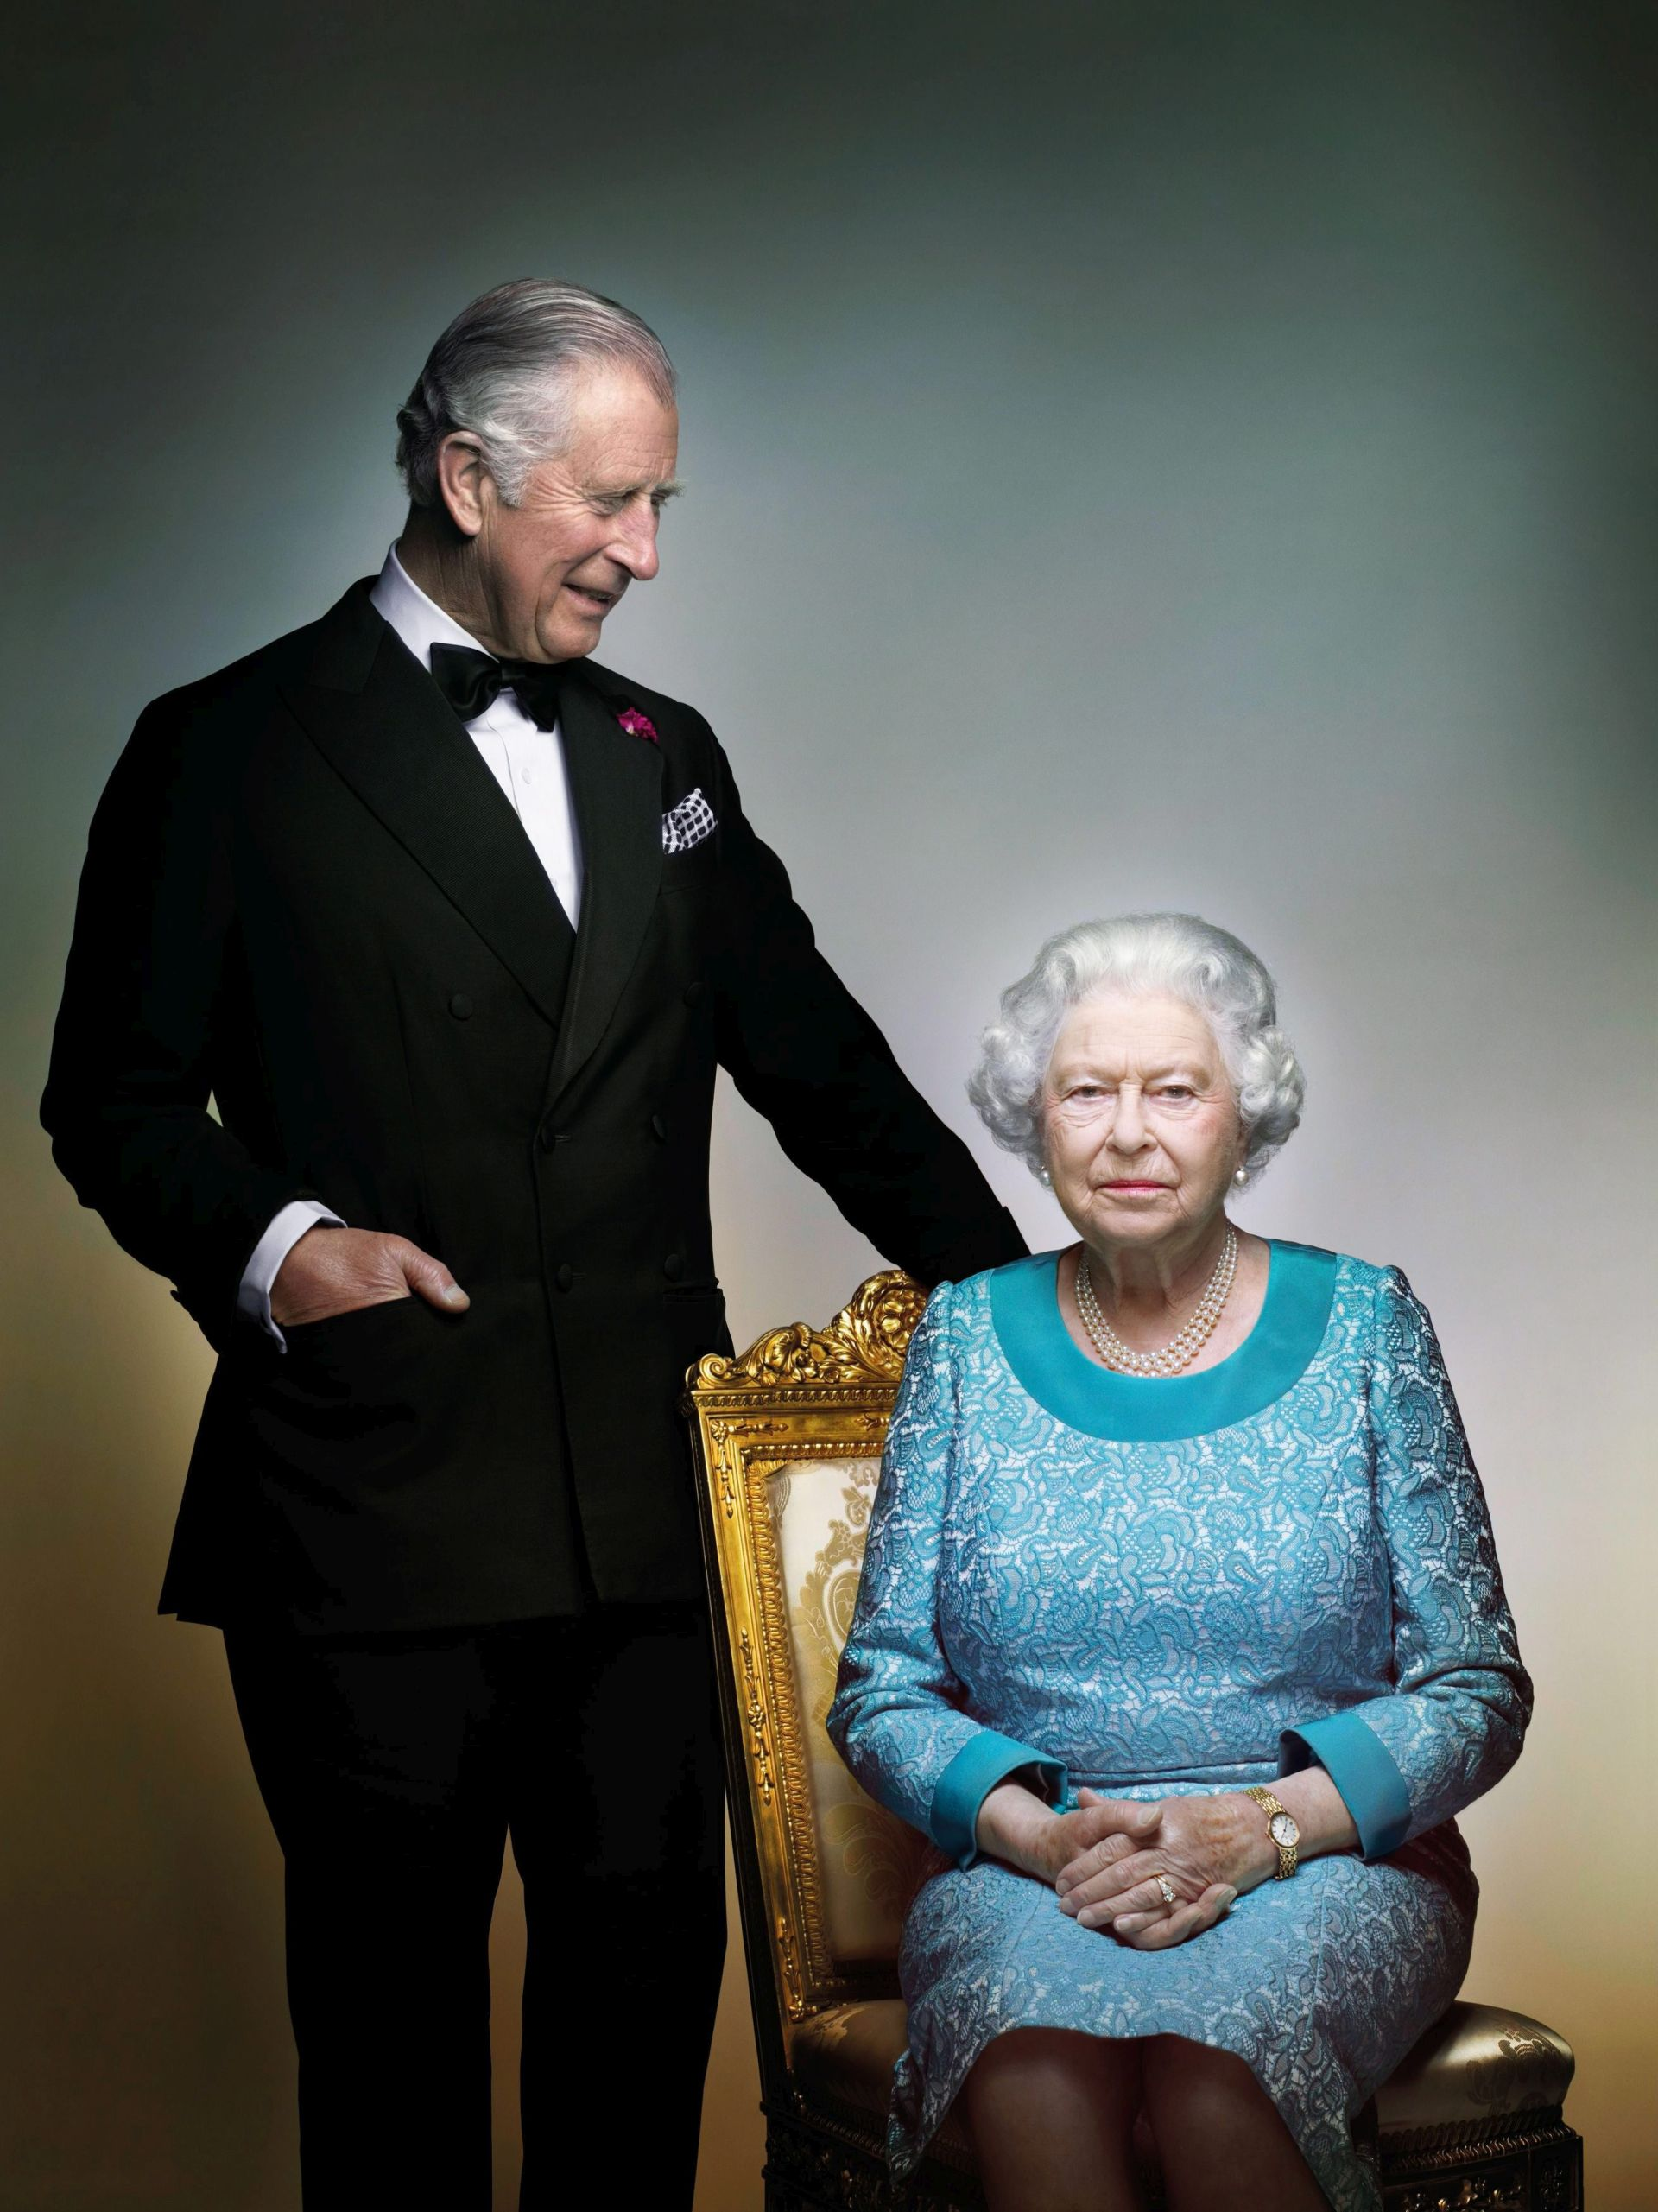 Objavljen Elizabetin portret u povodu 90. rođendana